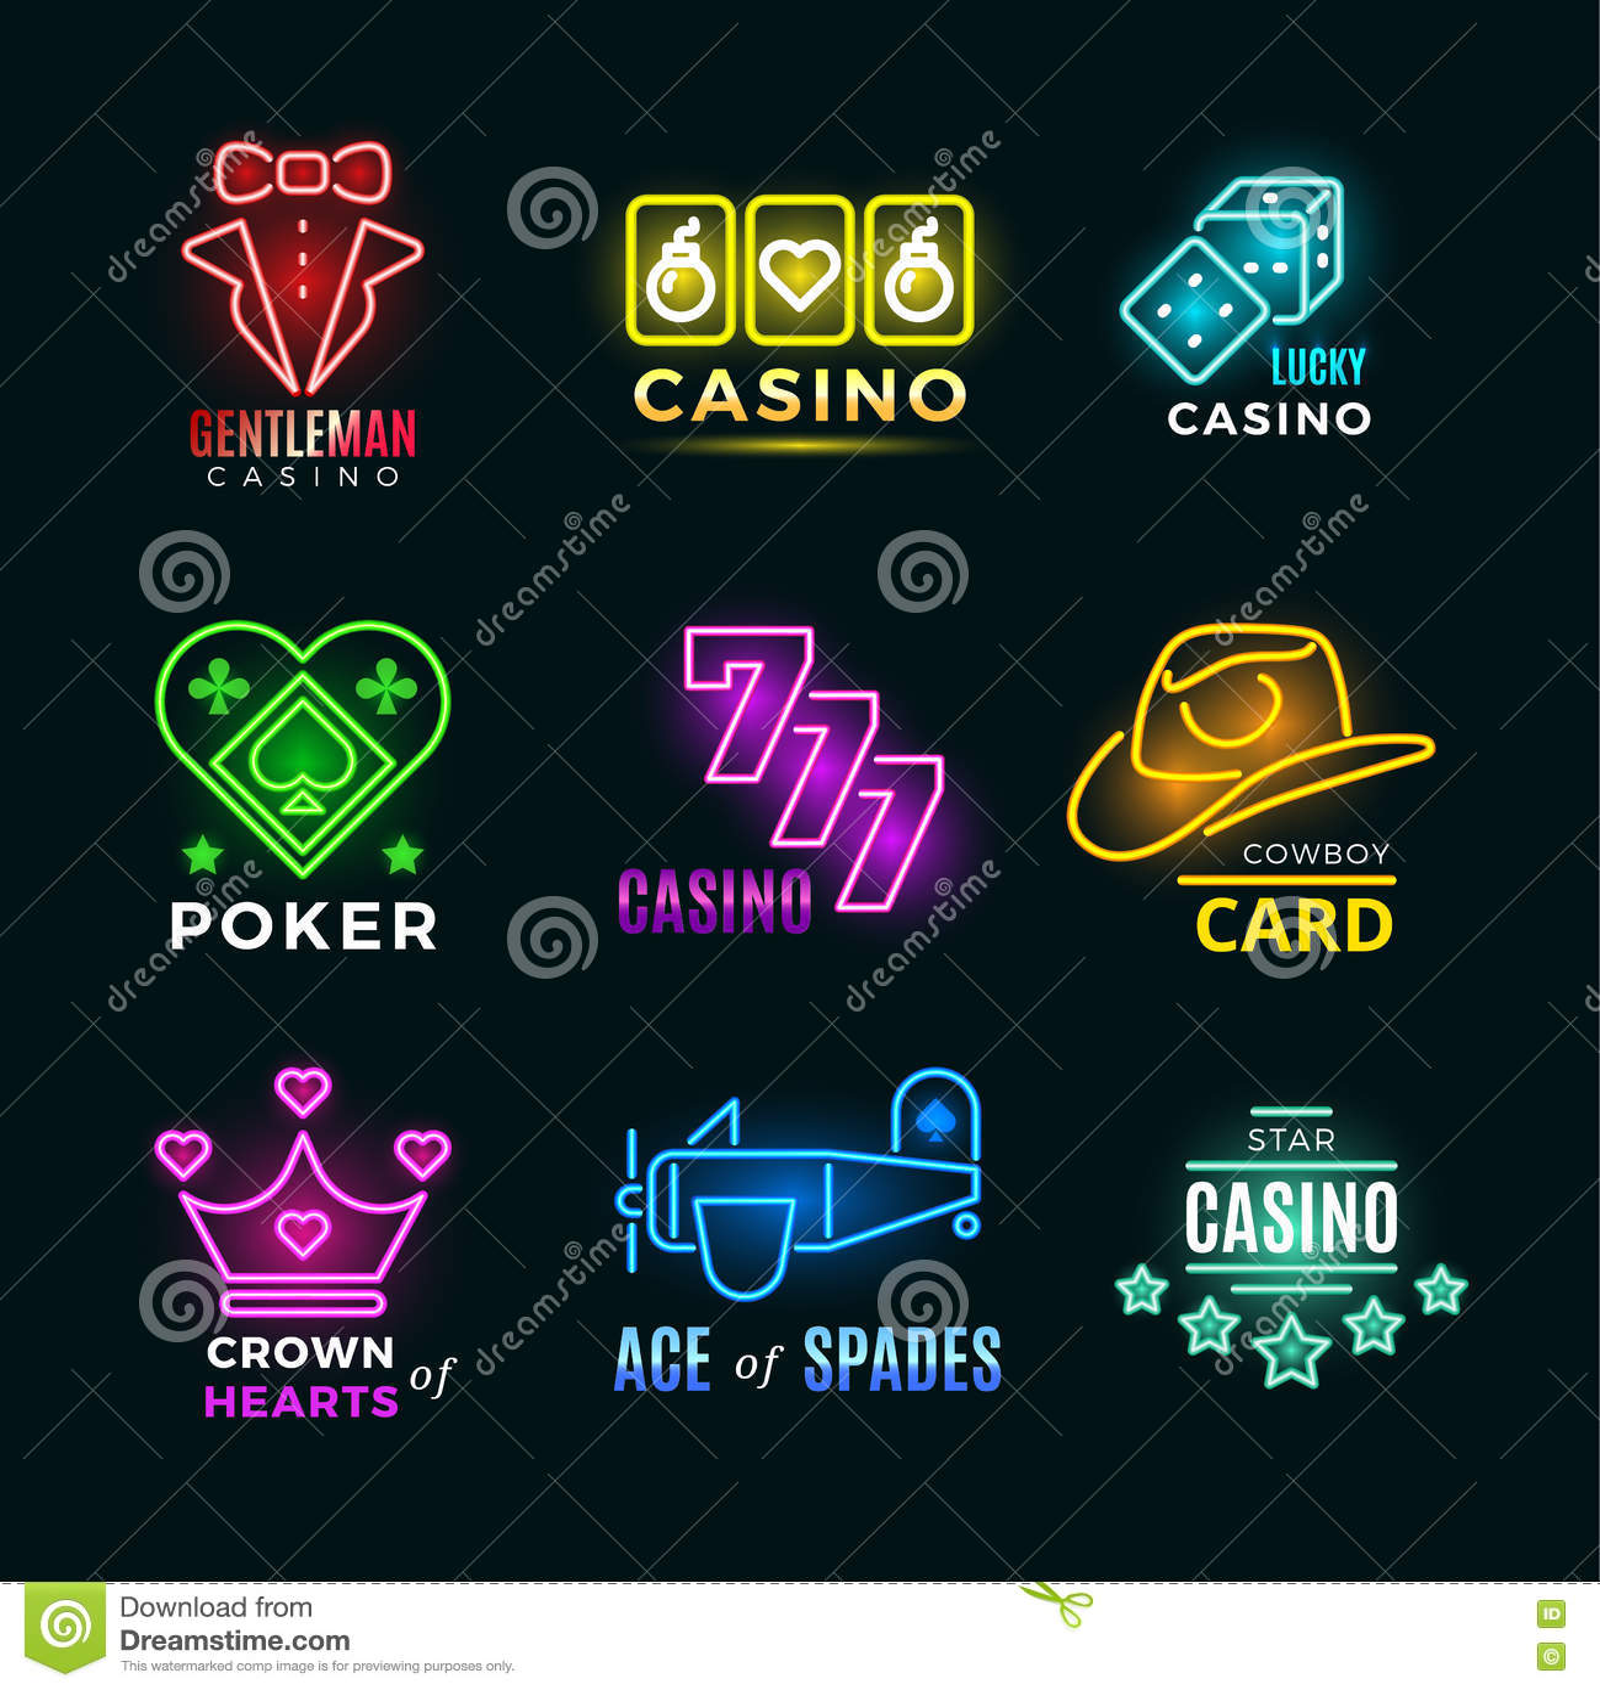 Poker Ace of Spades LED Neon Light Sign